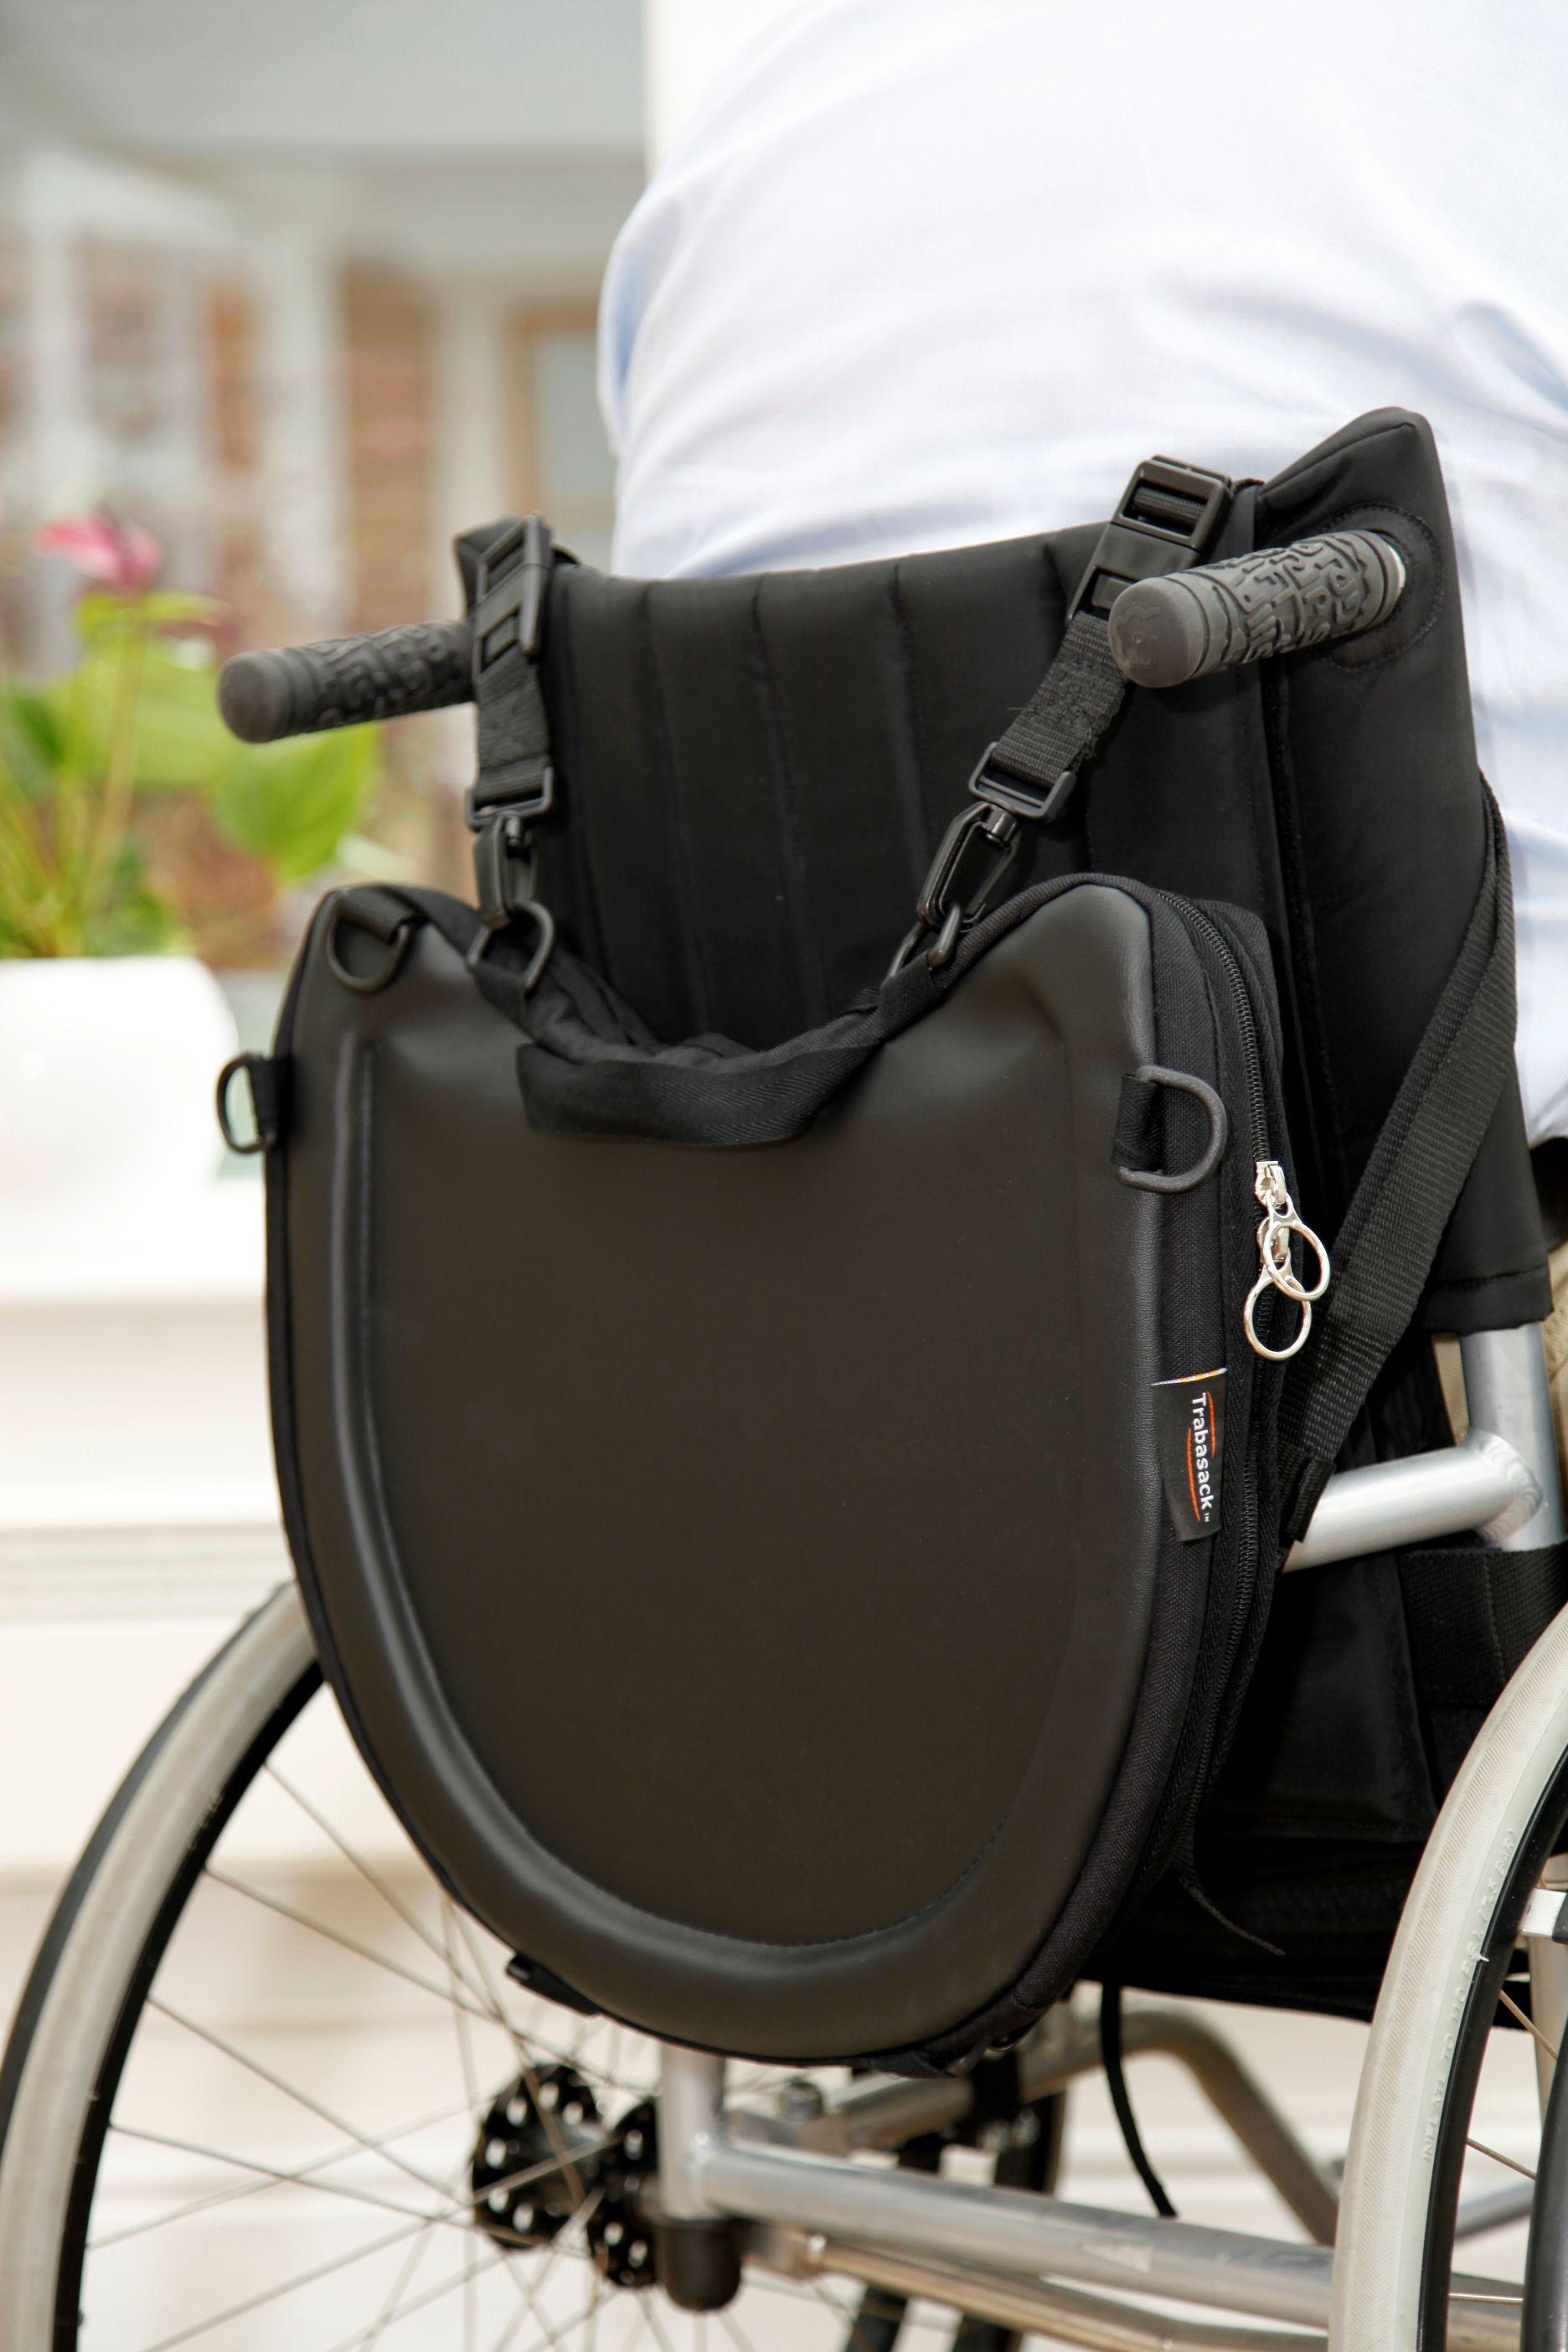 Stylish Wheelchair Bag Cushions Accessories Hospital Crps Disability